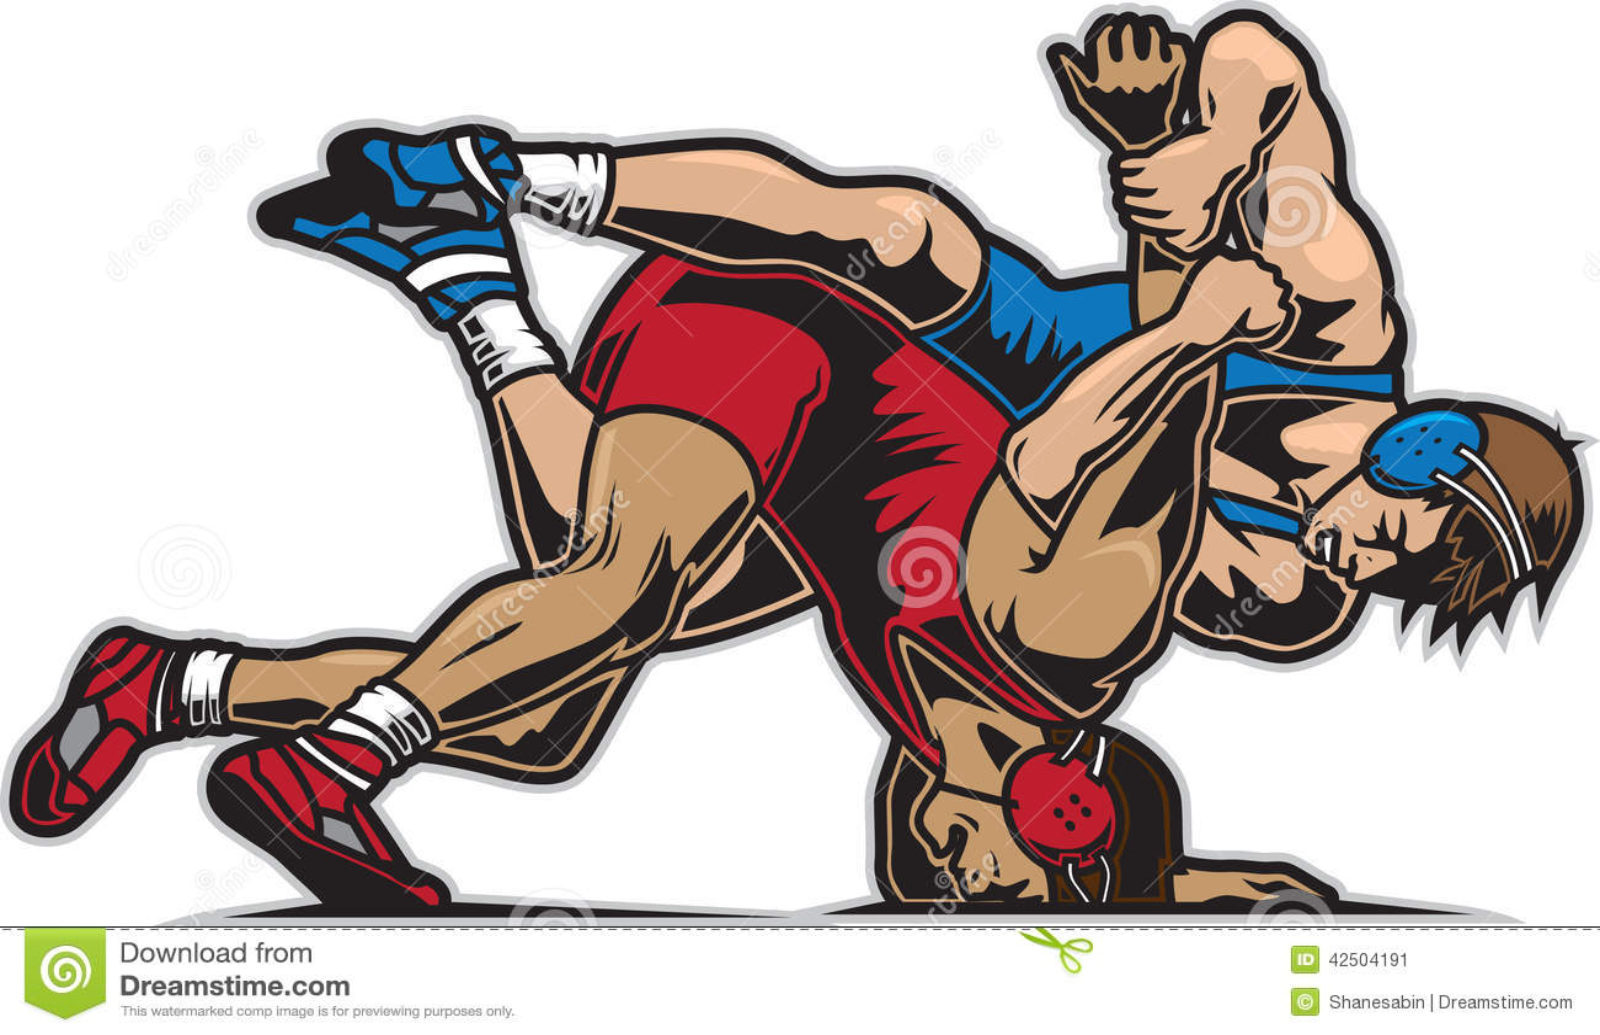 Wrestling Design Clip Art